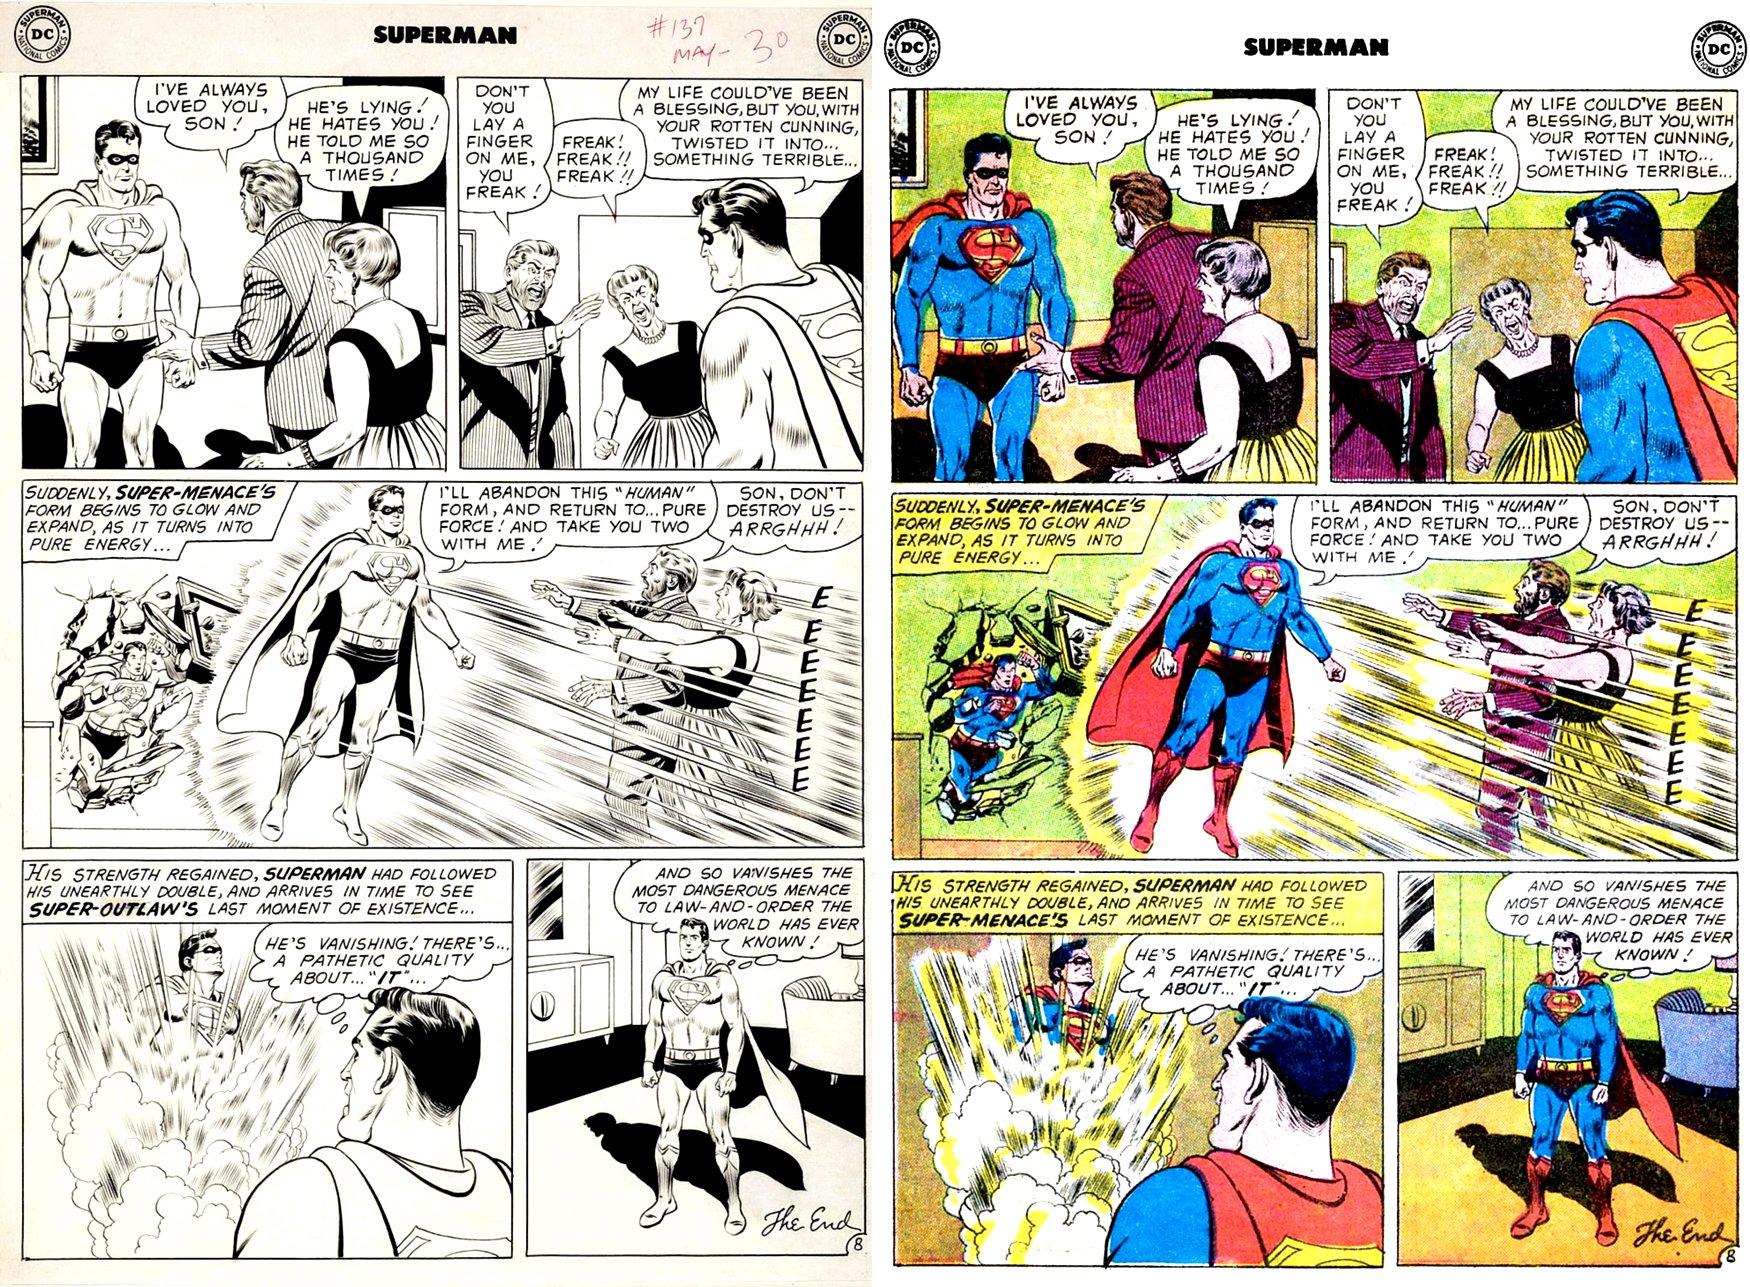 Superman #137 p 8 (VERY EARLY SWAN / FORTE SUPERMAN ART!) Large Art - 1959